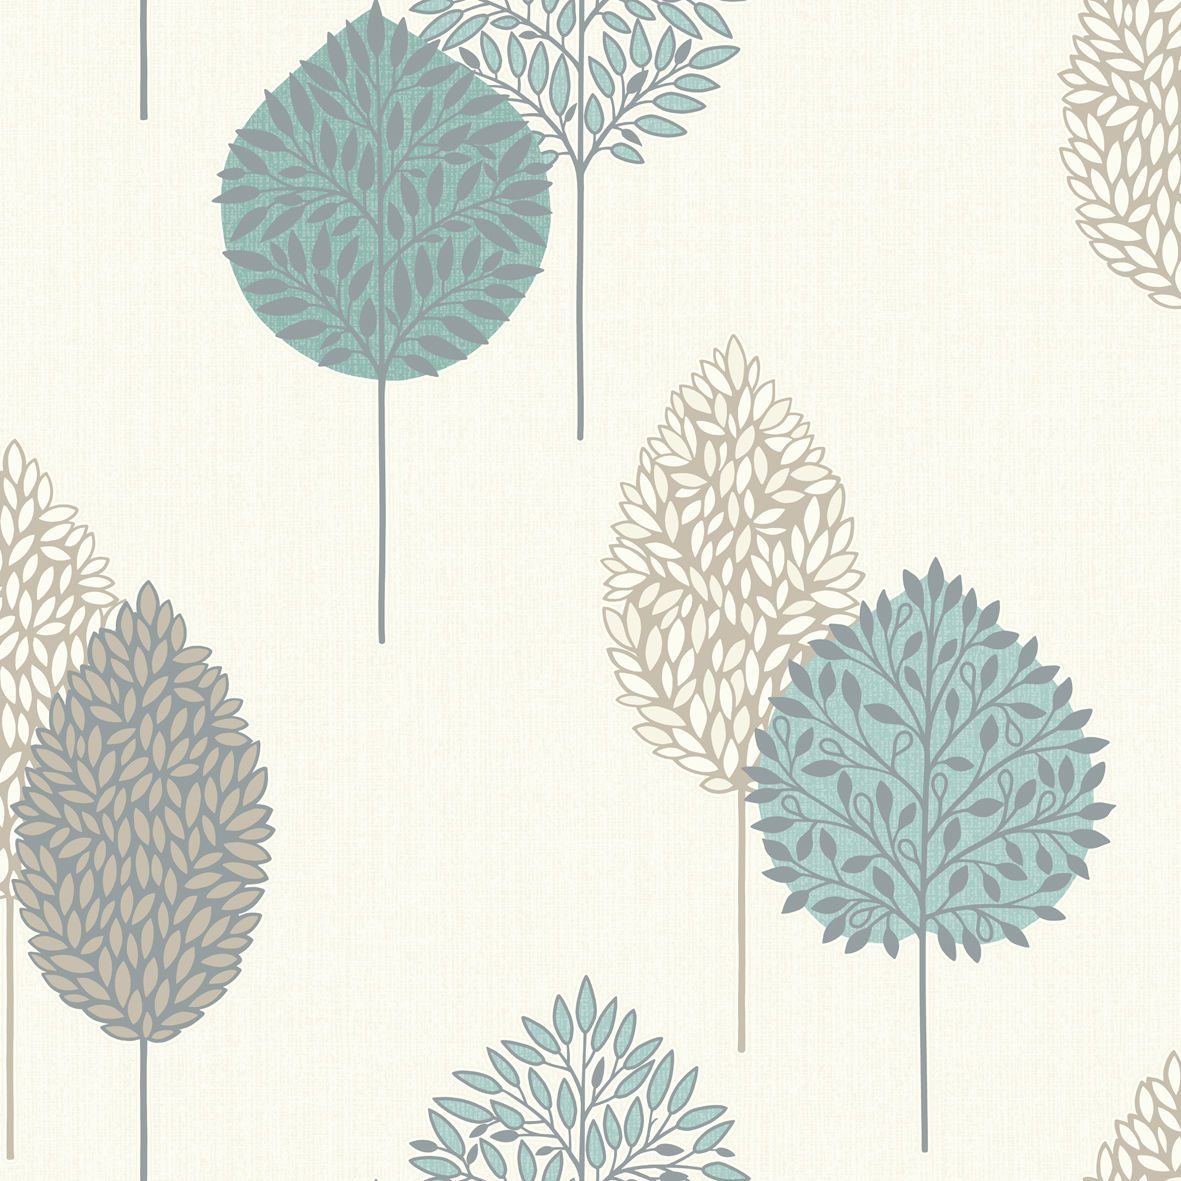 Home diy wallpaper illustration arthouse imagine fern plum motif vinyl - Dante Leaf Motif Teal Textured Wallpaper By Arthouse Opera 884002 Ebay